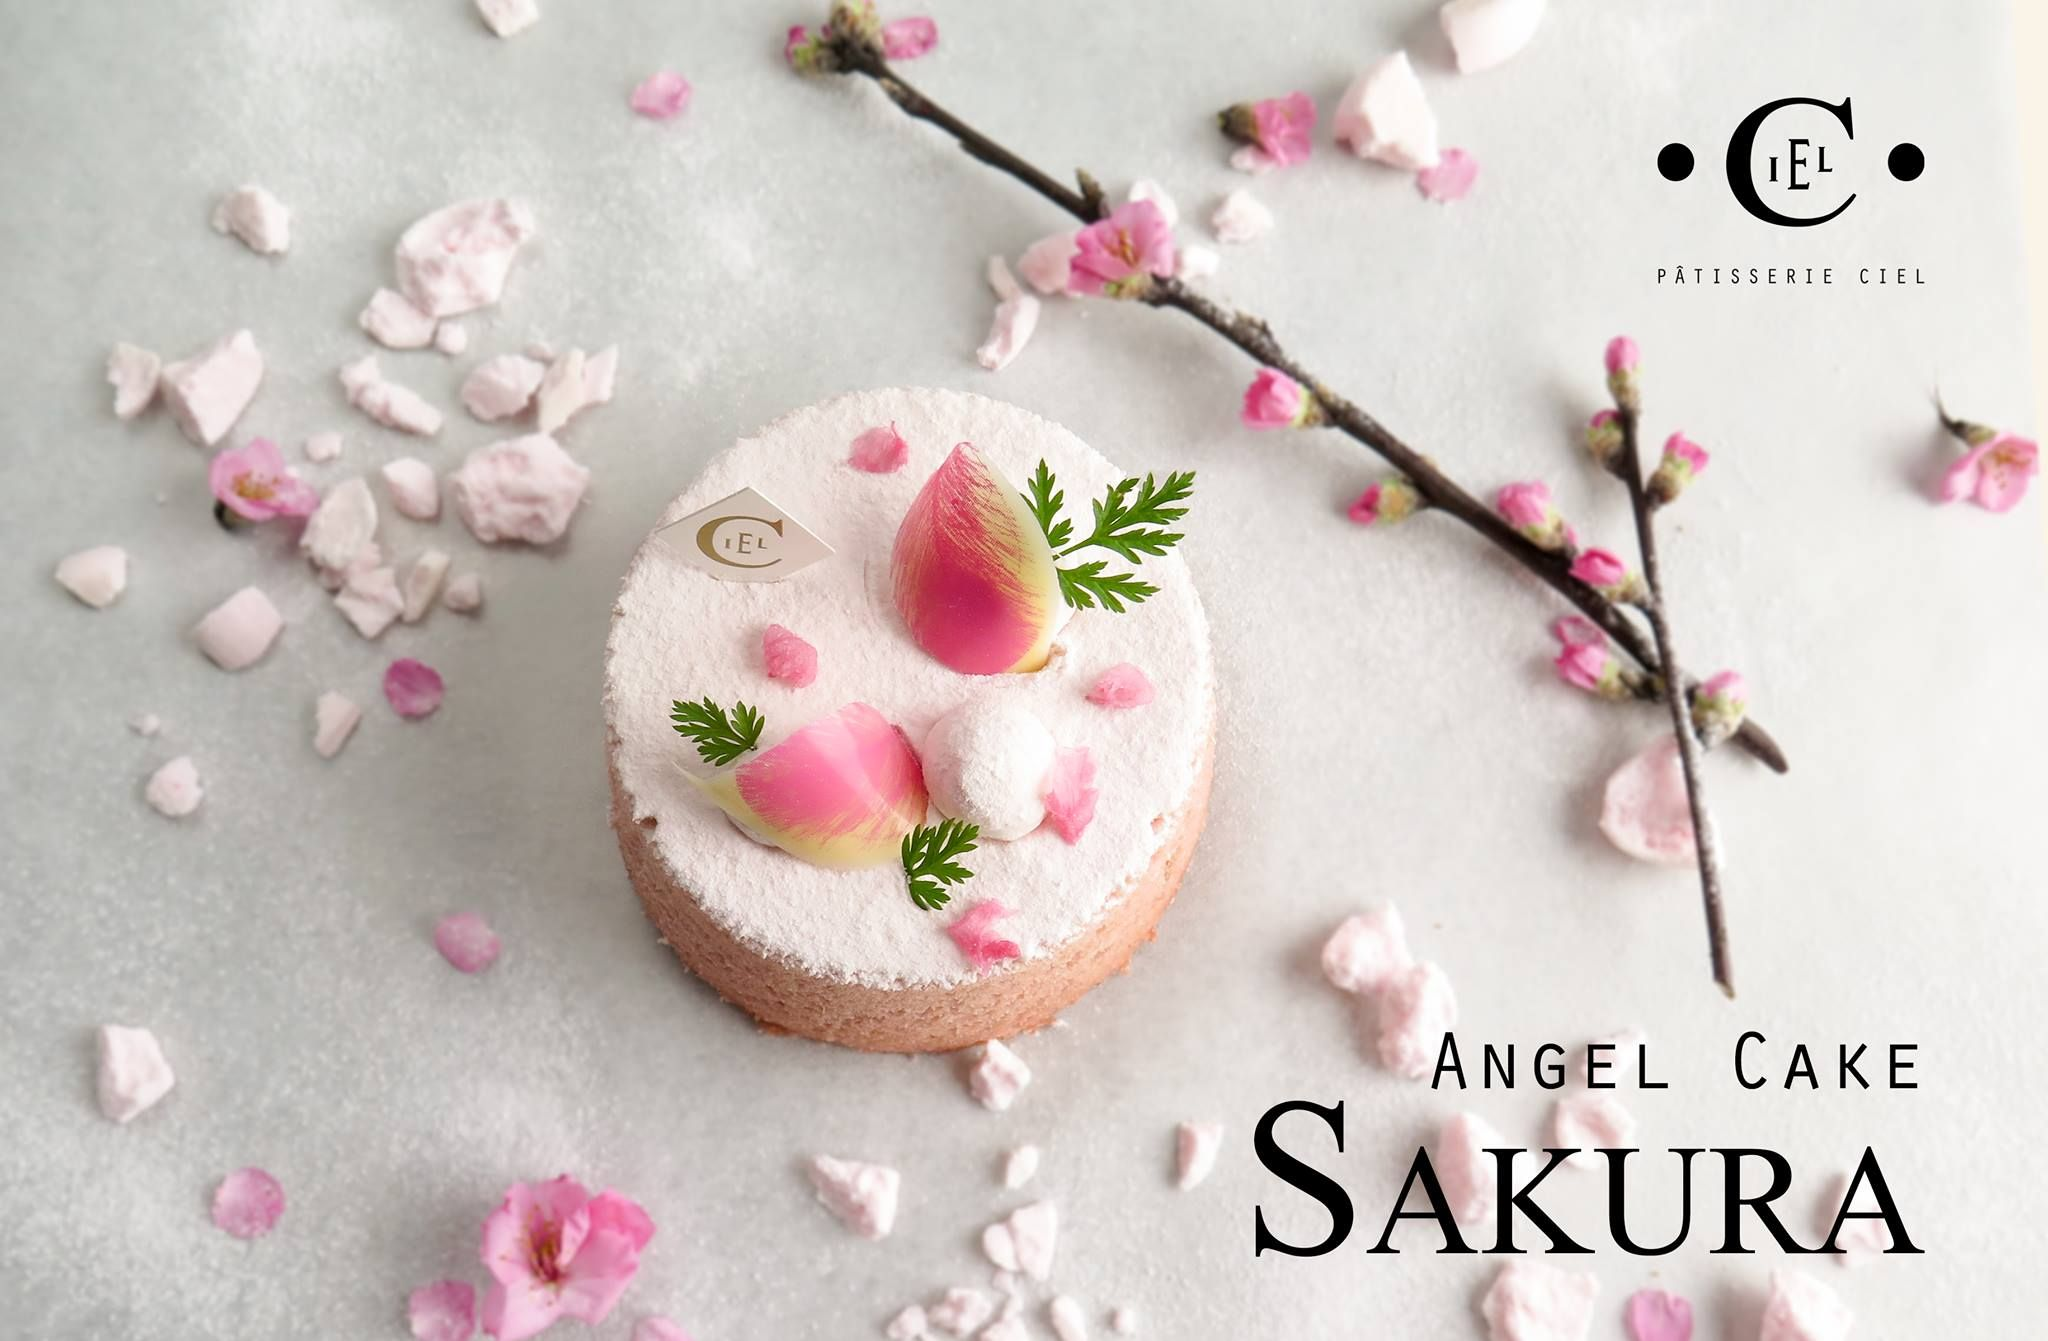 Sakura Angel Cake Patisserie Ciel Patisserie Patisserie Haute Couture Desserts Japonais